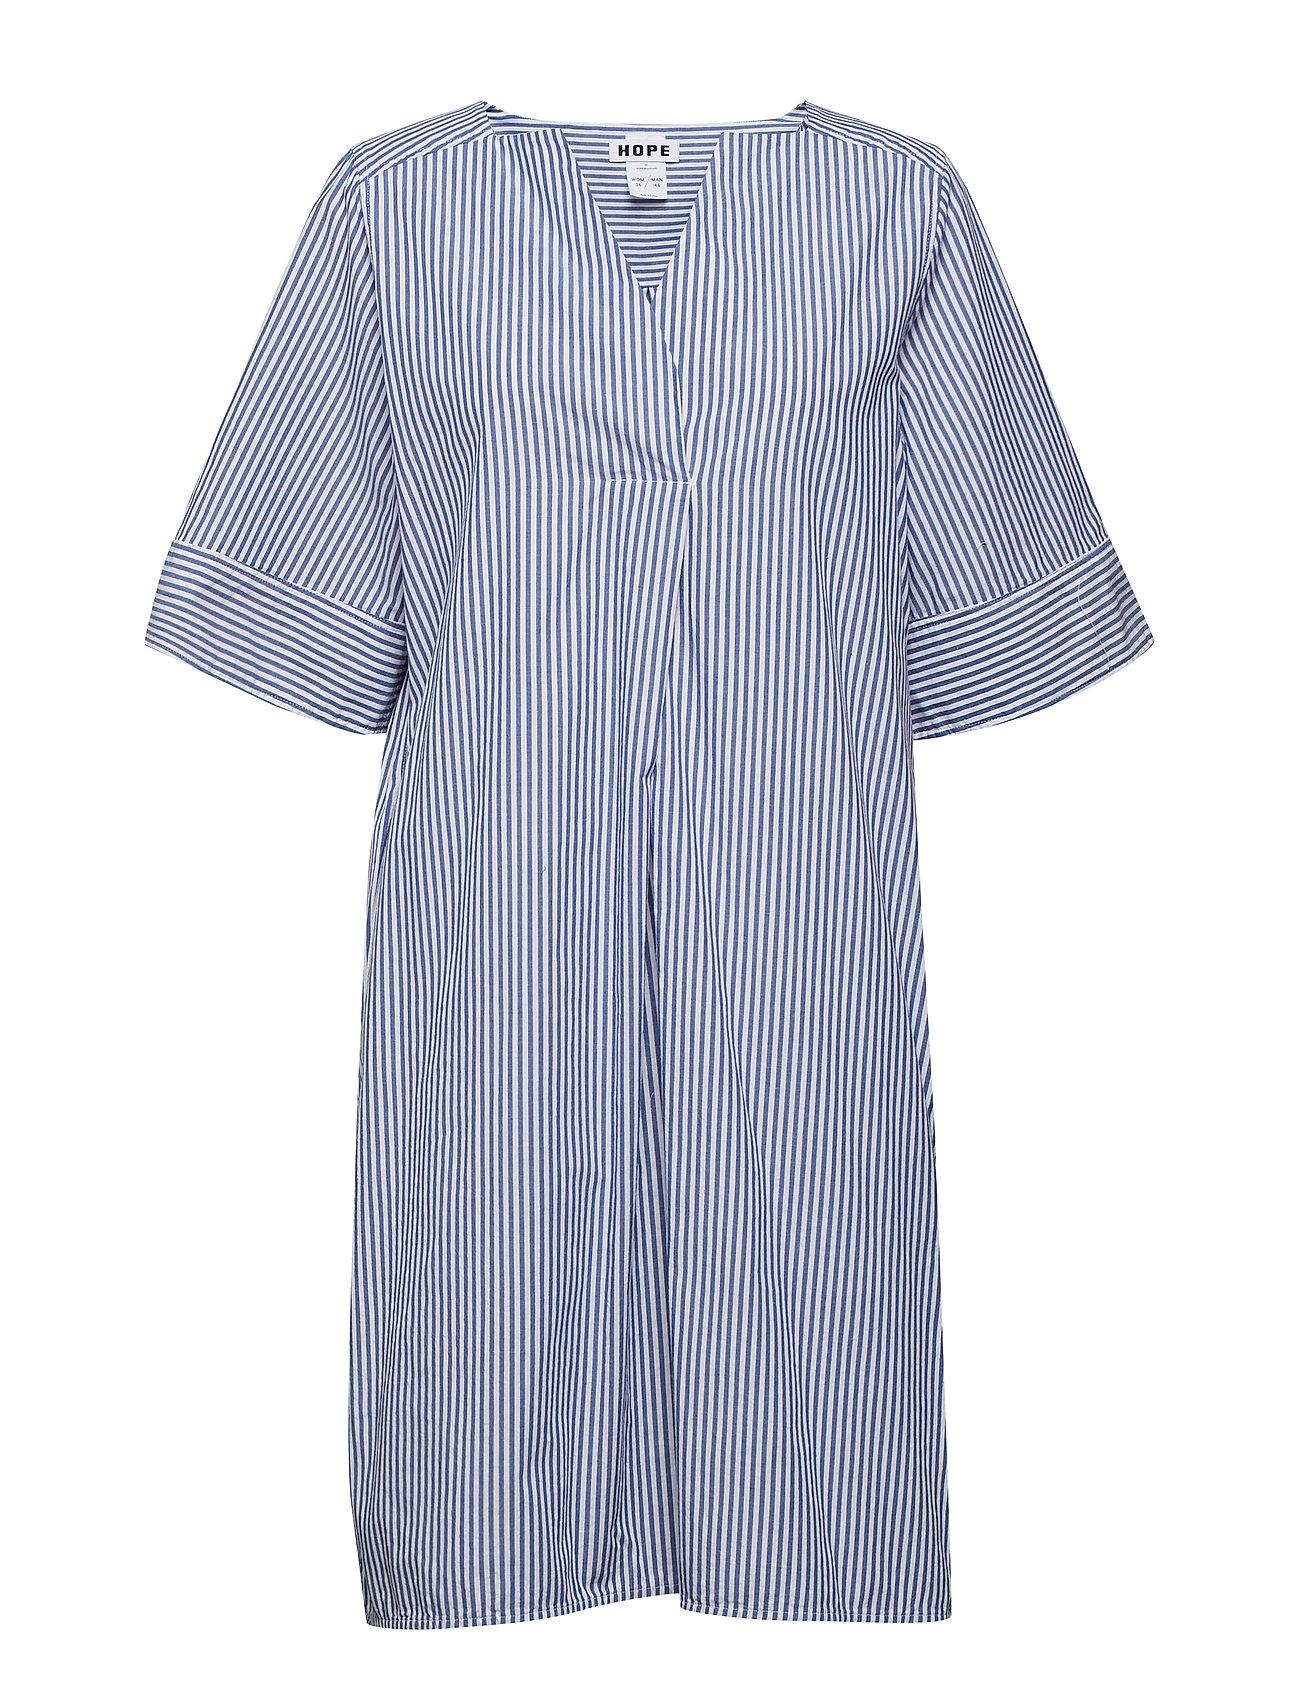 Hope Mono Dress - BLUE STRIPE